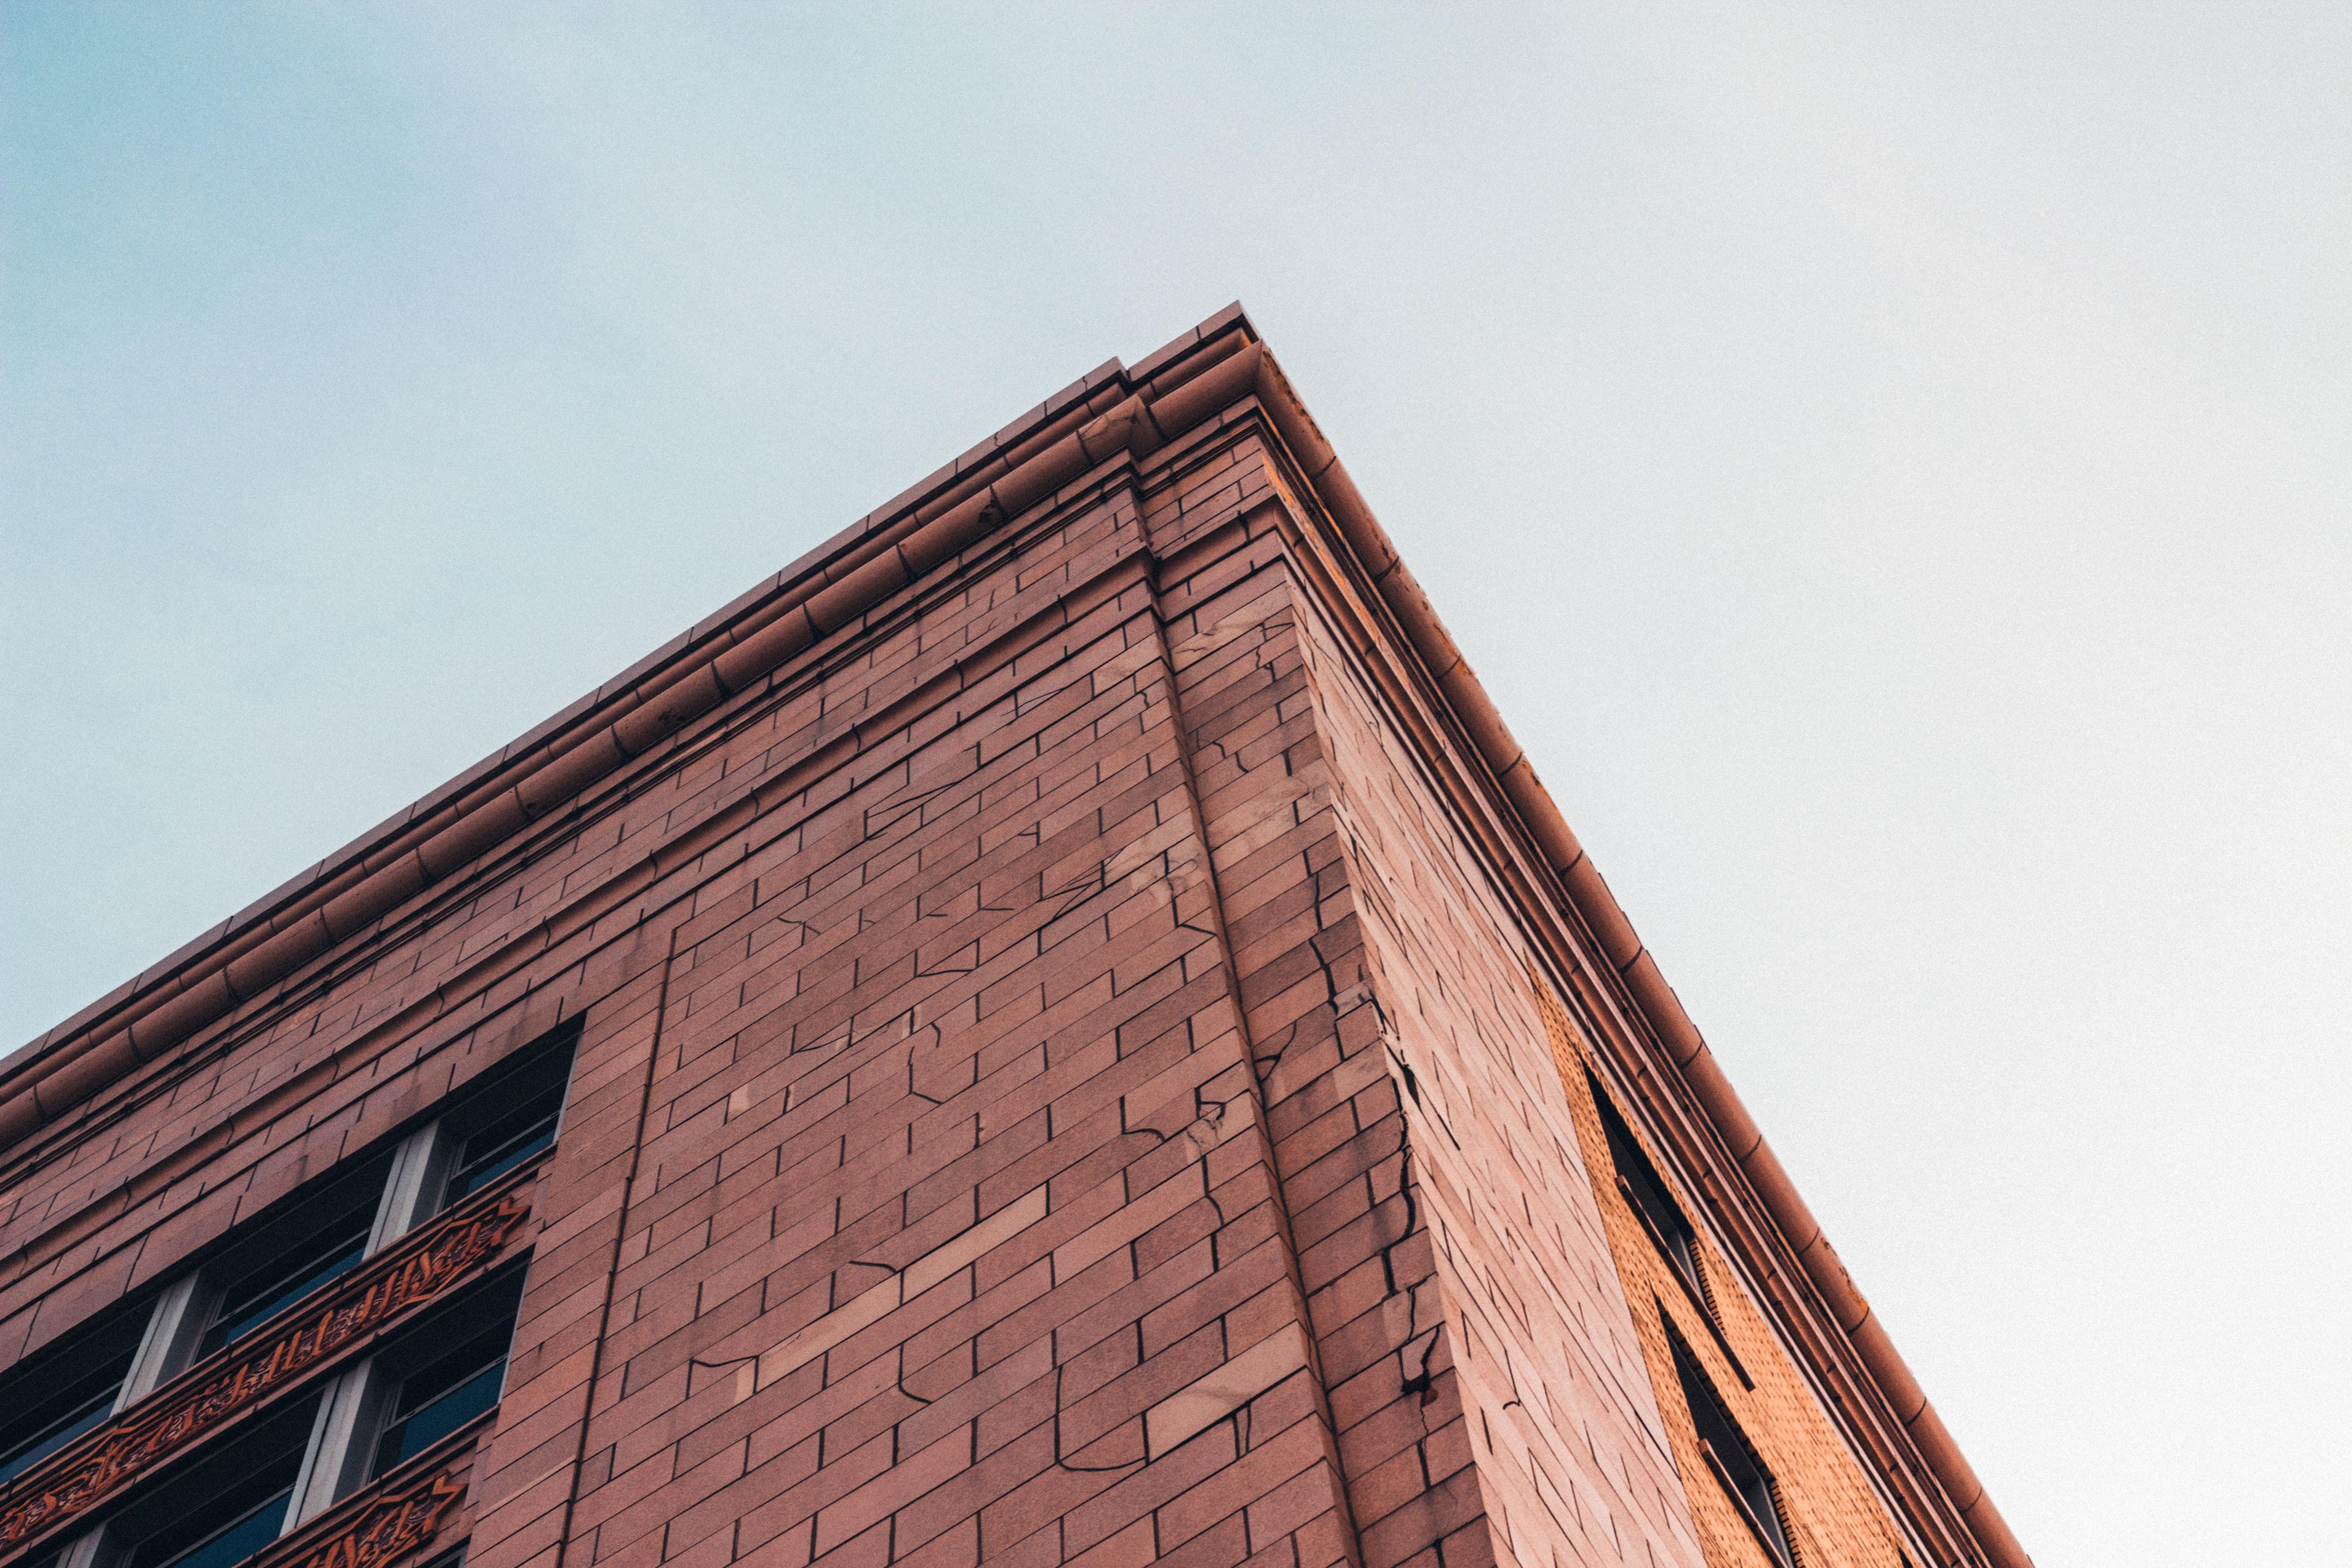 low angle of orange brick building